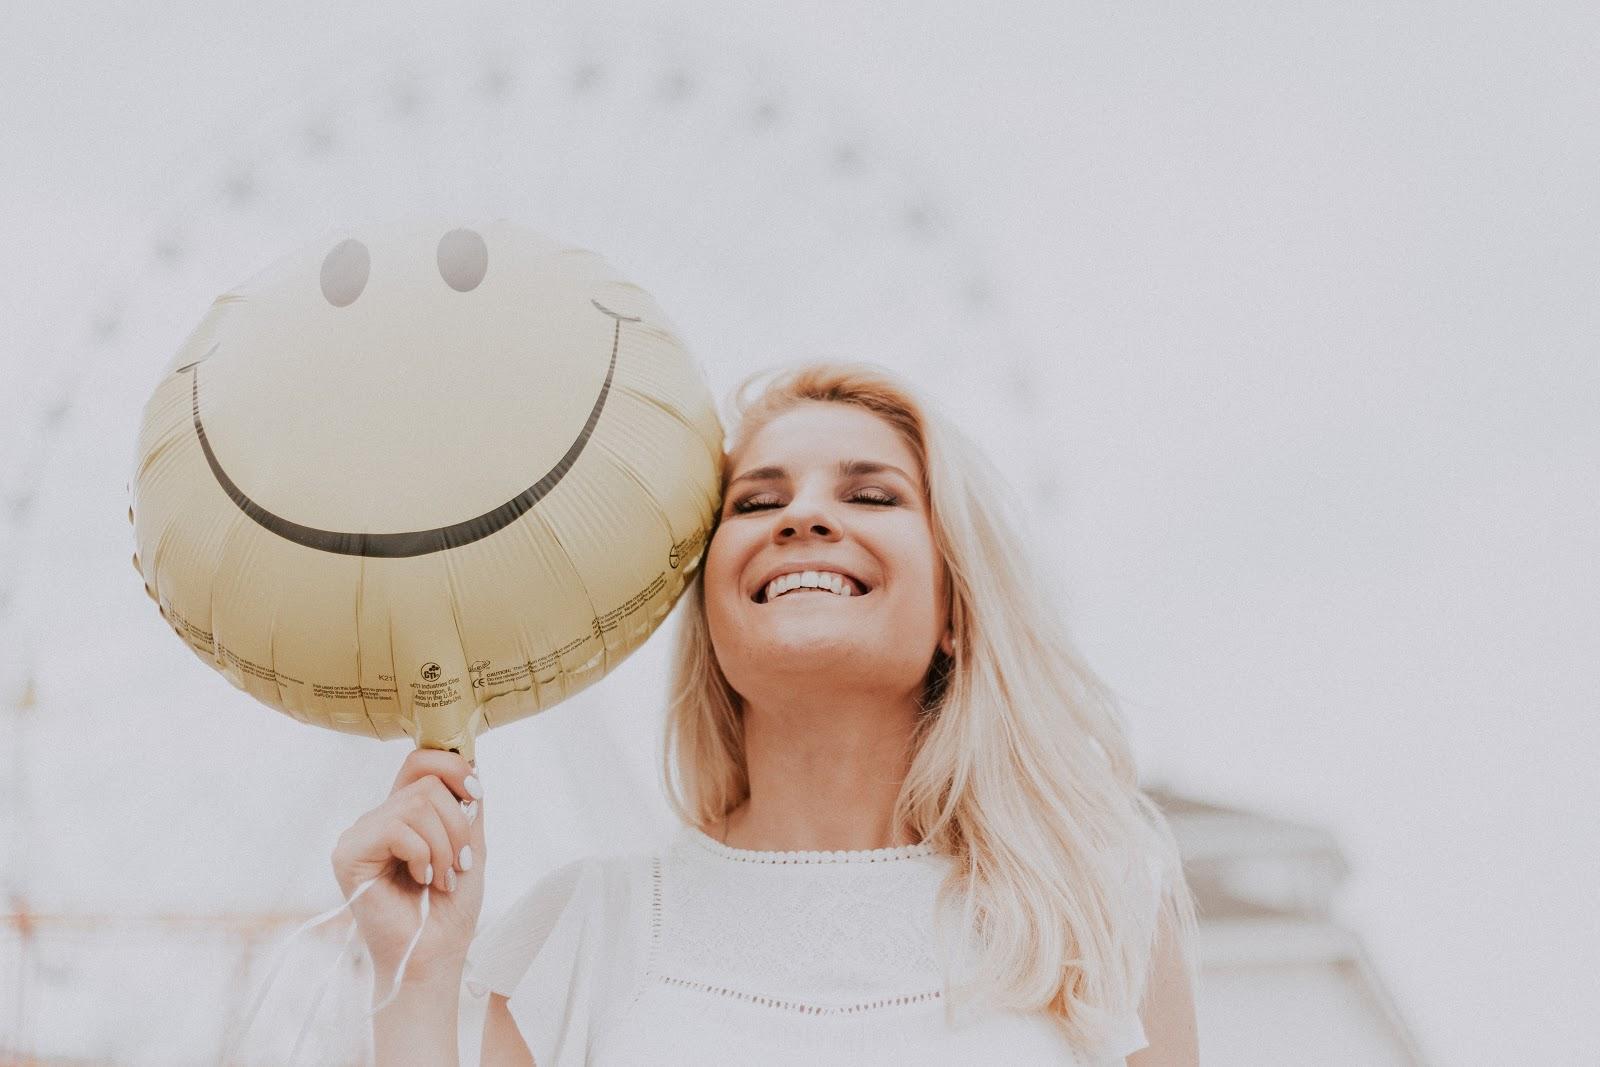 Woman holding up a smiley-face balloon.